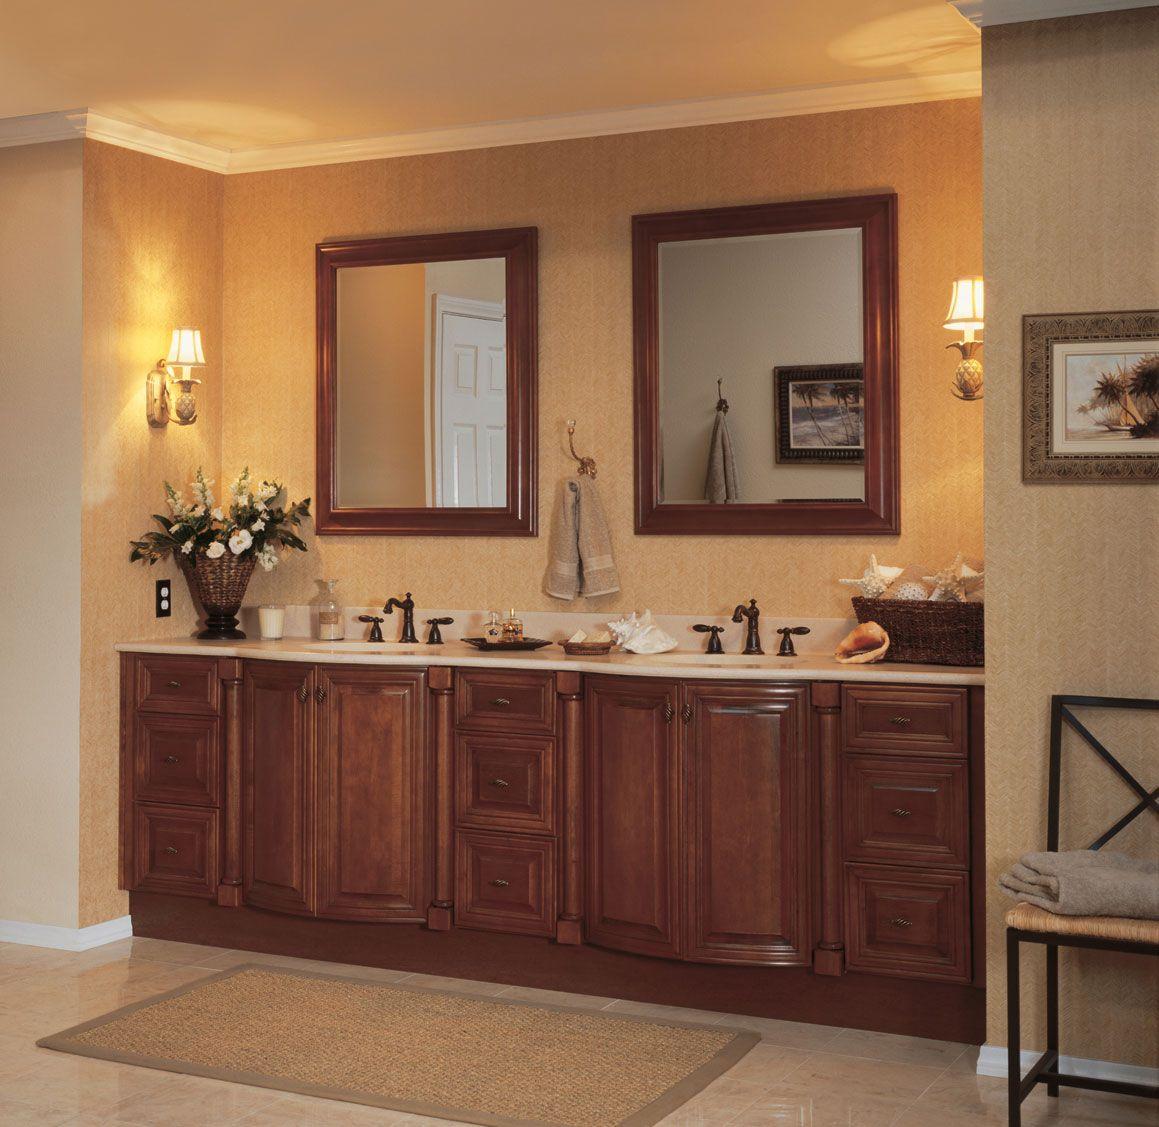 Small Bathroom Decorating Ideas Small Bathroom Wooden - 96 bathroom vanity cabinets for bathroom decor ideas